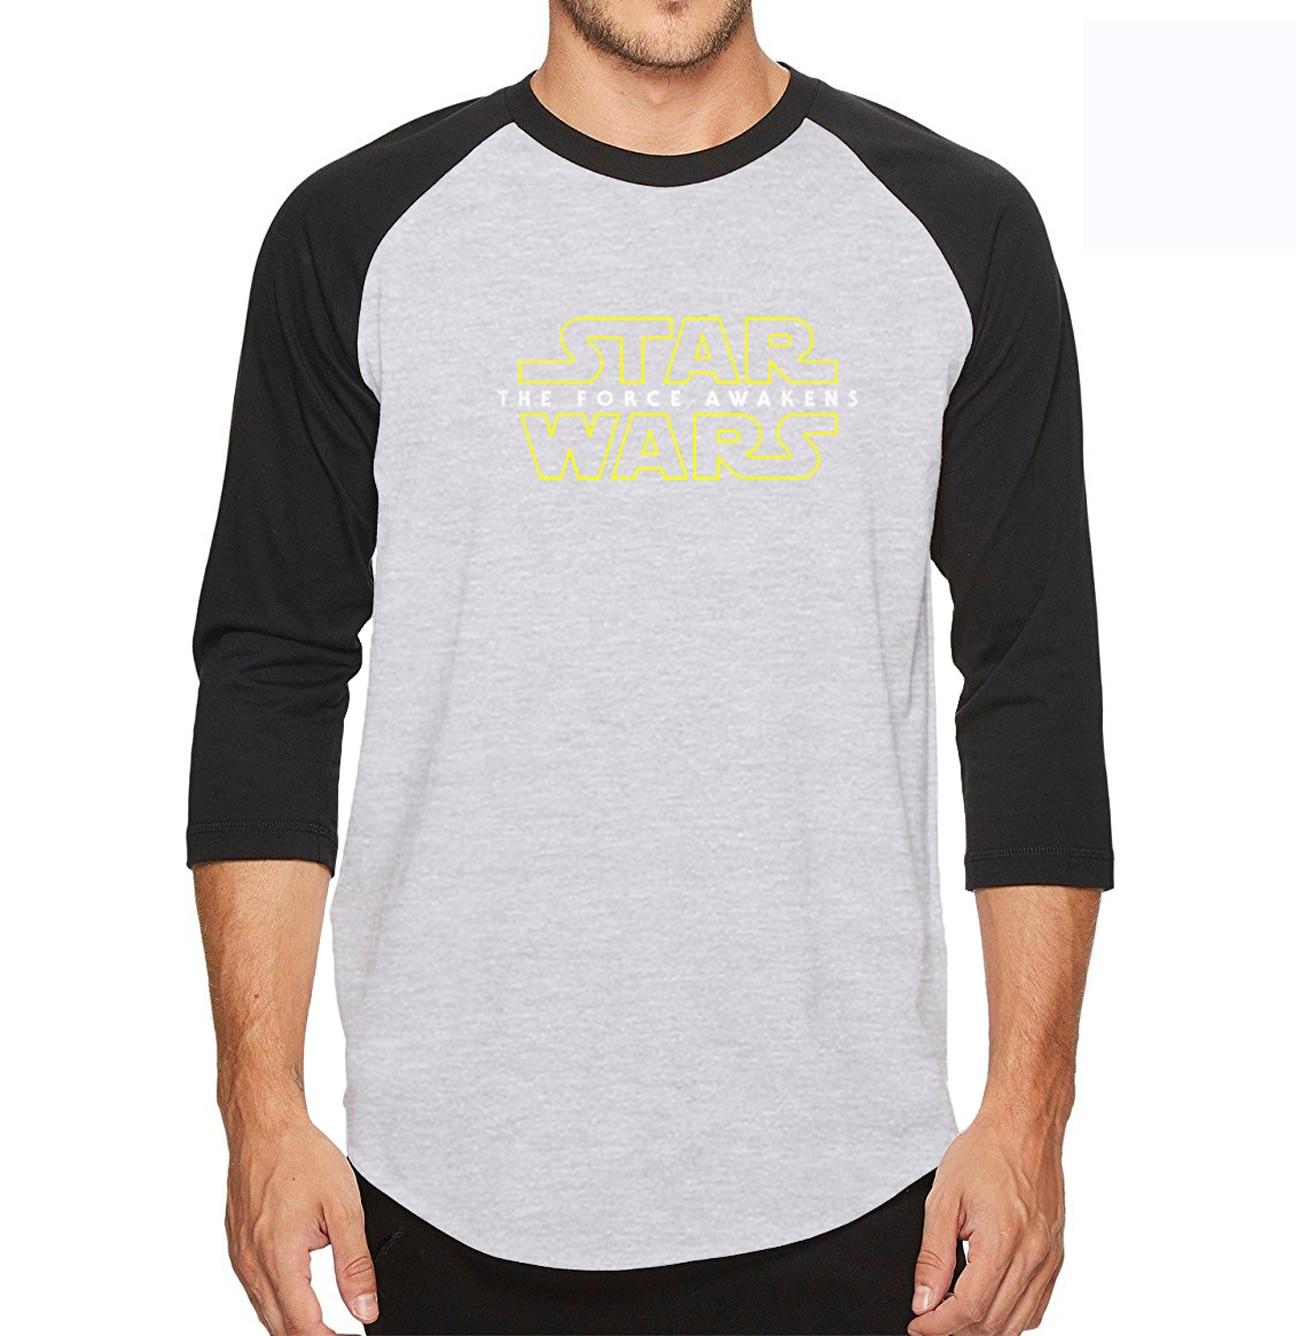 Summer New Starwars Black Knight Three Quarter Sleeve T Shirt Men 100% Cotton High Quality personality T-Shirt